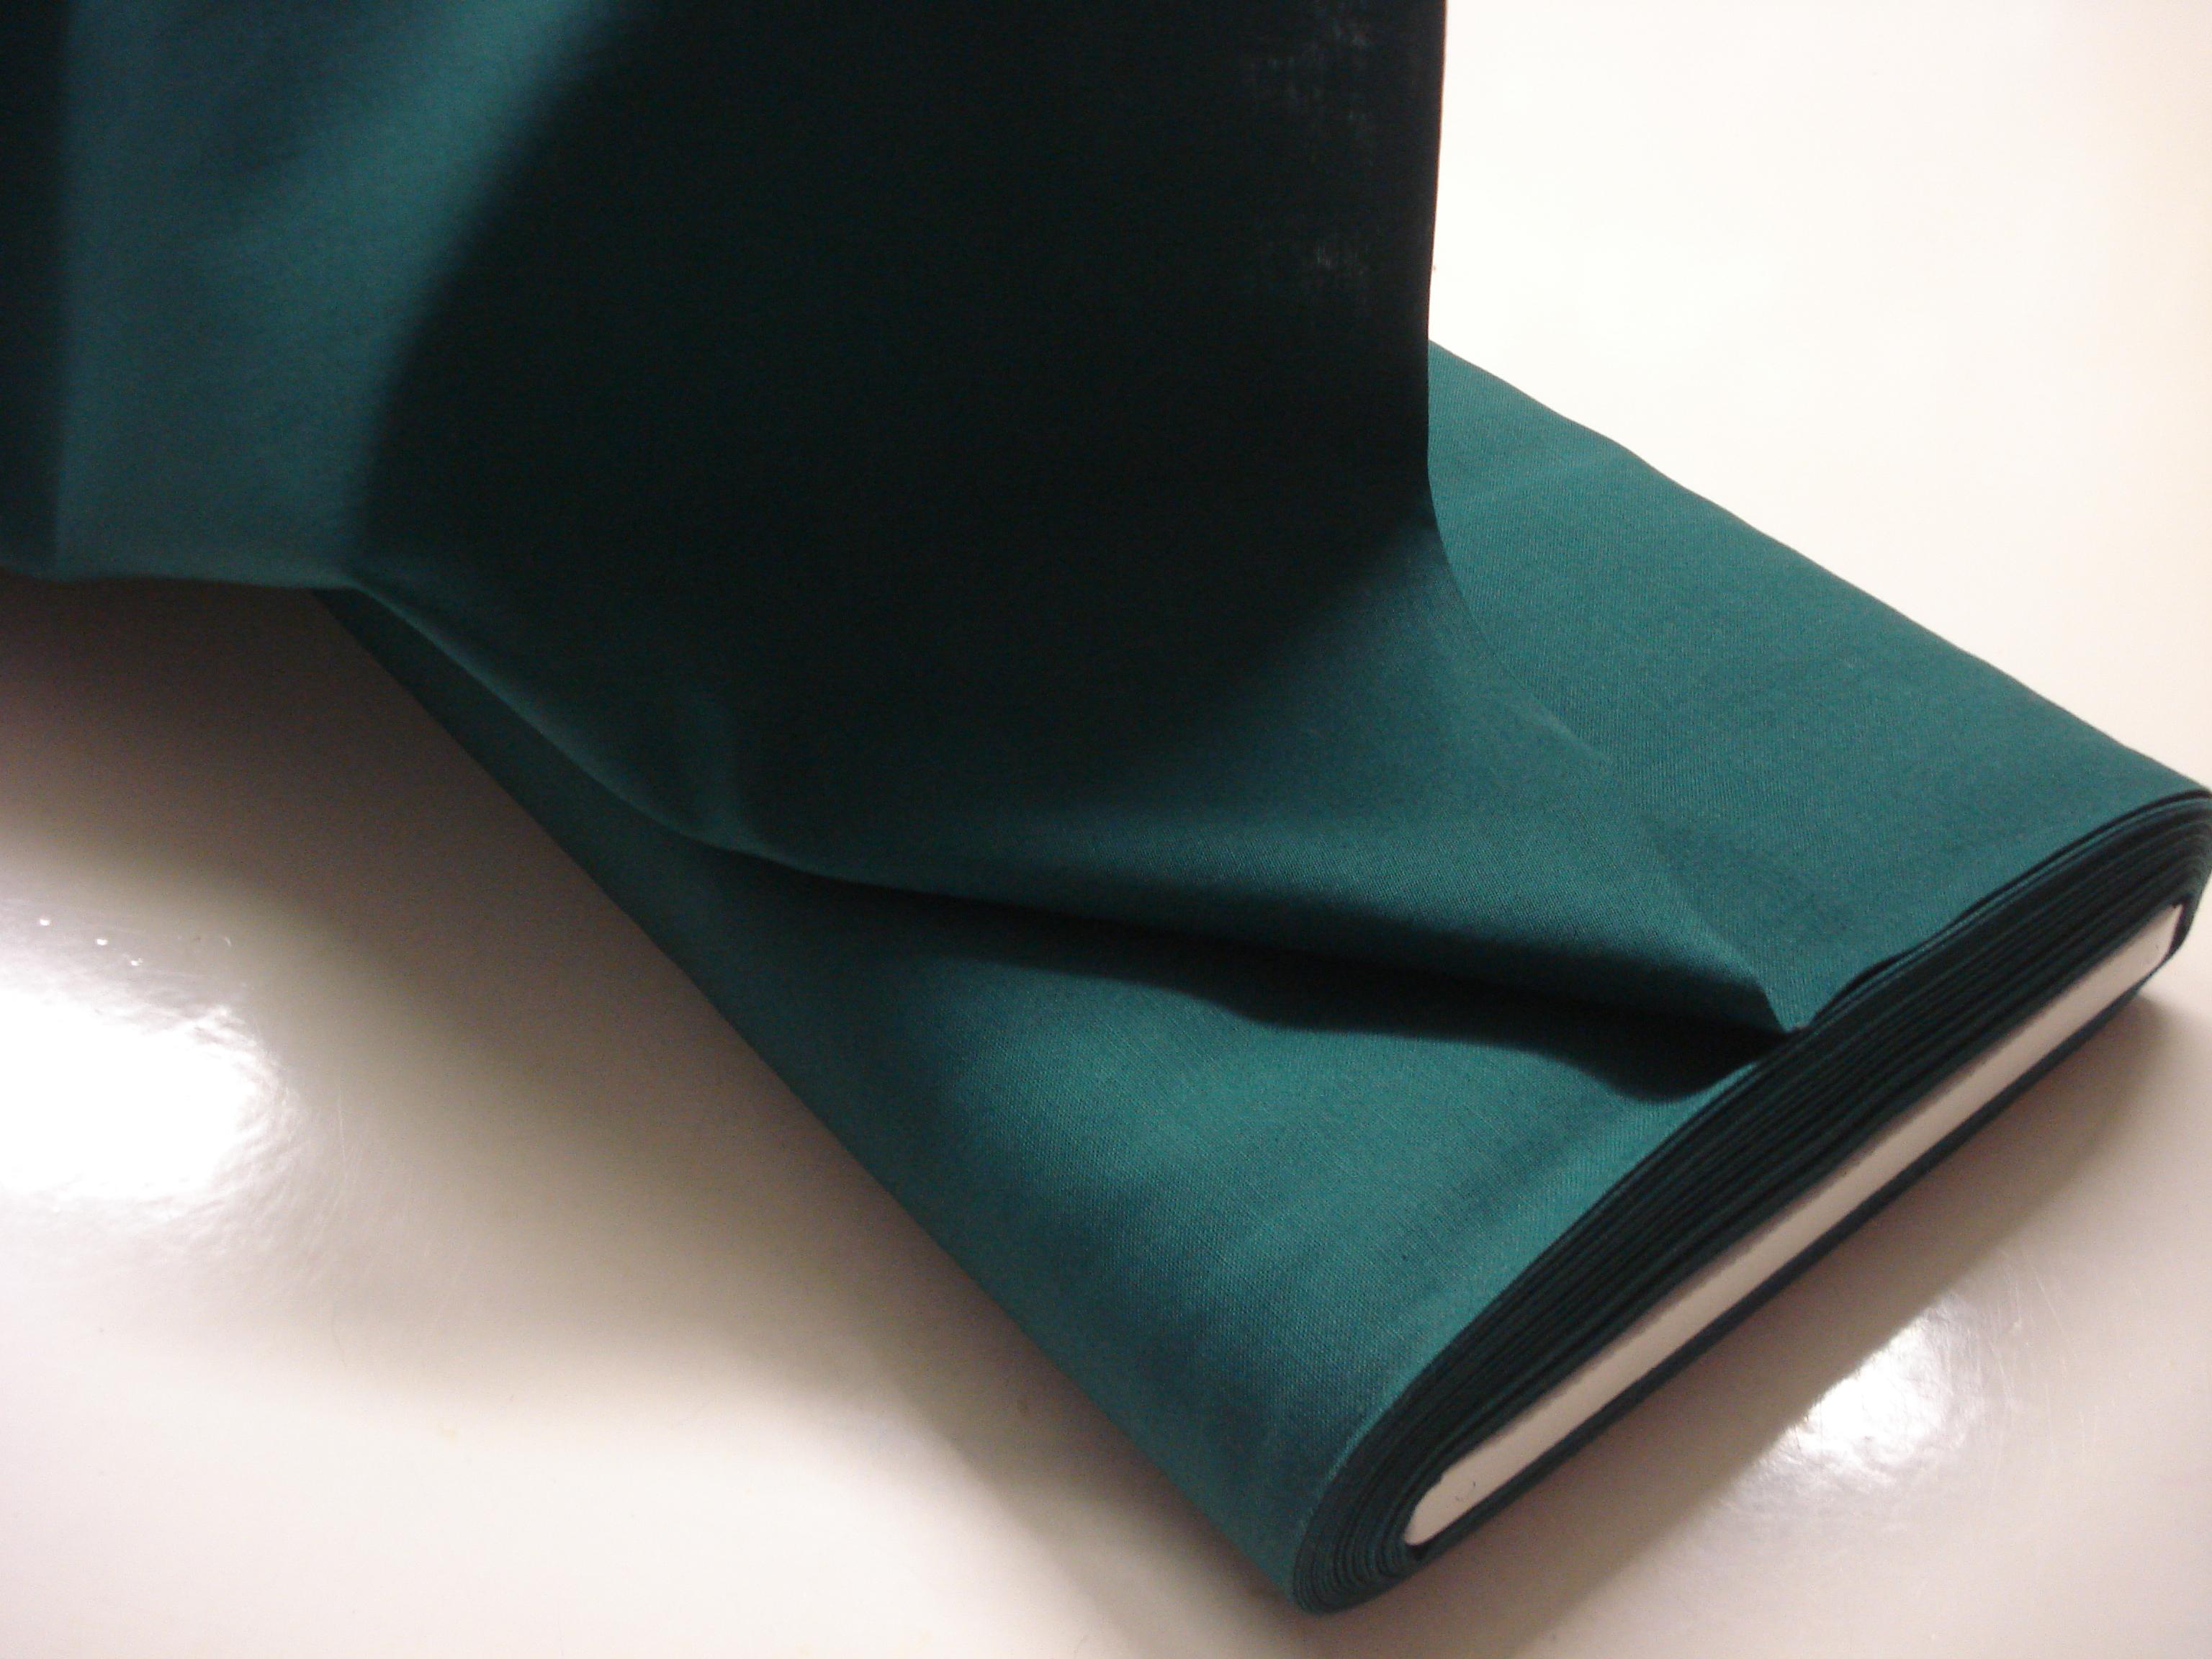 Katoen effen - Groen